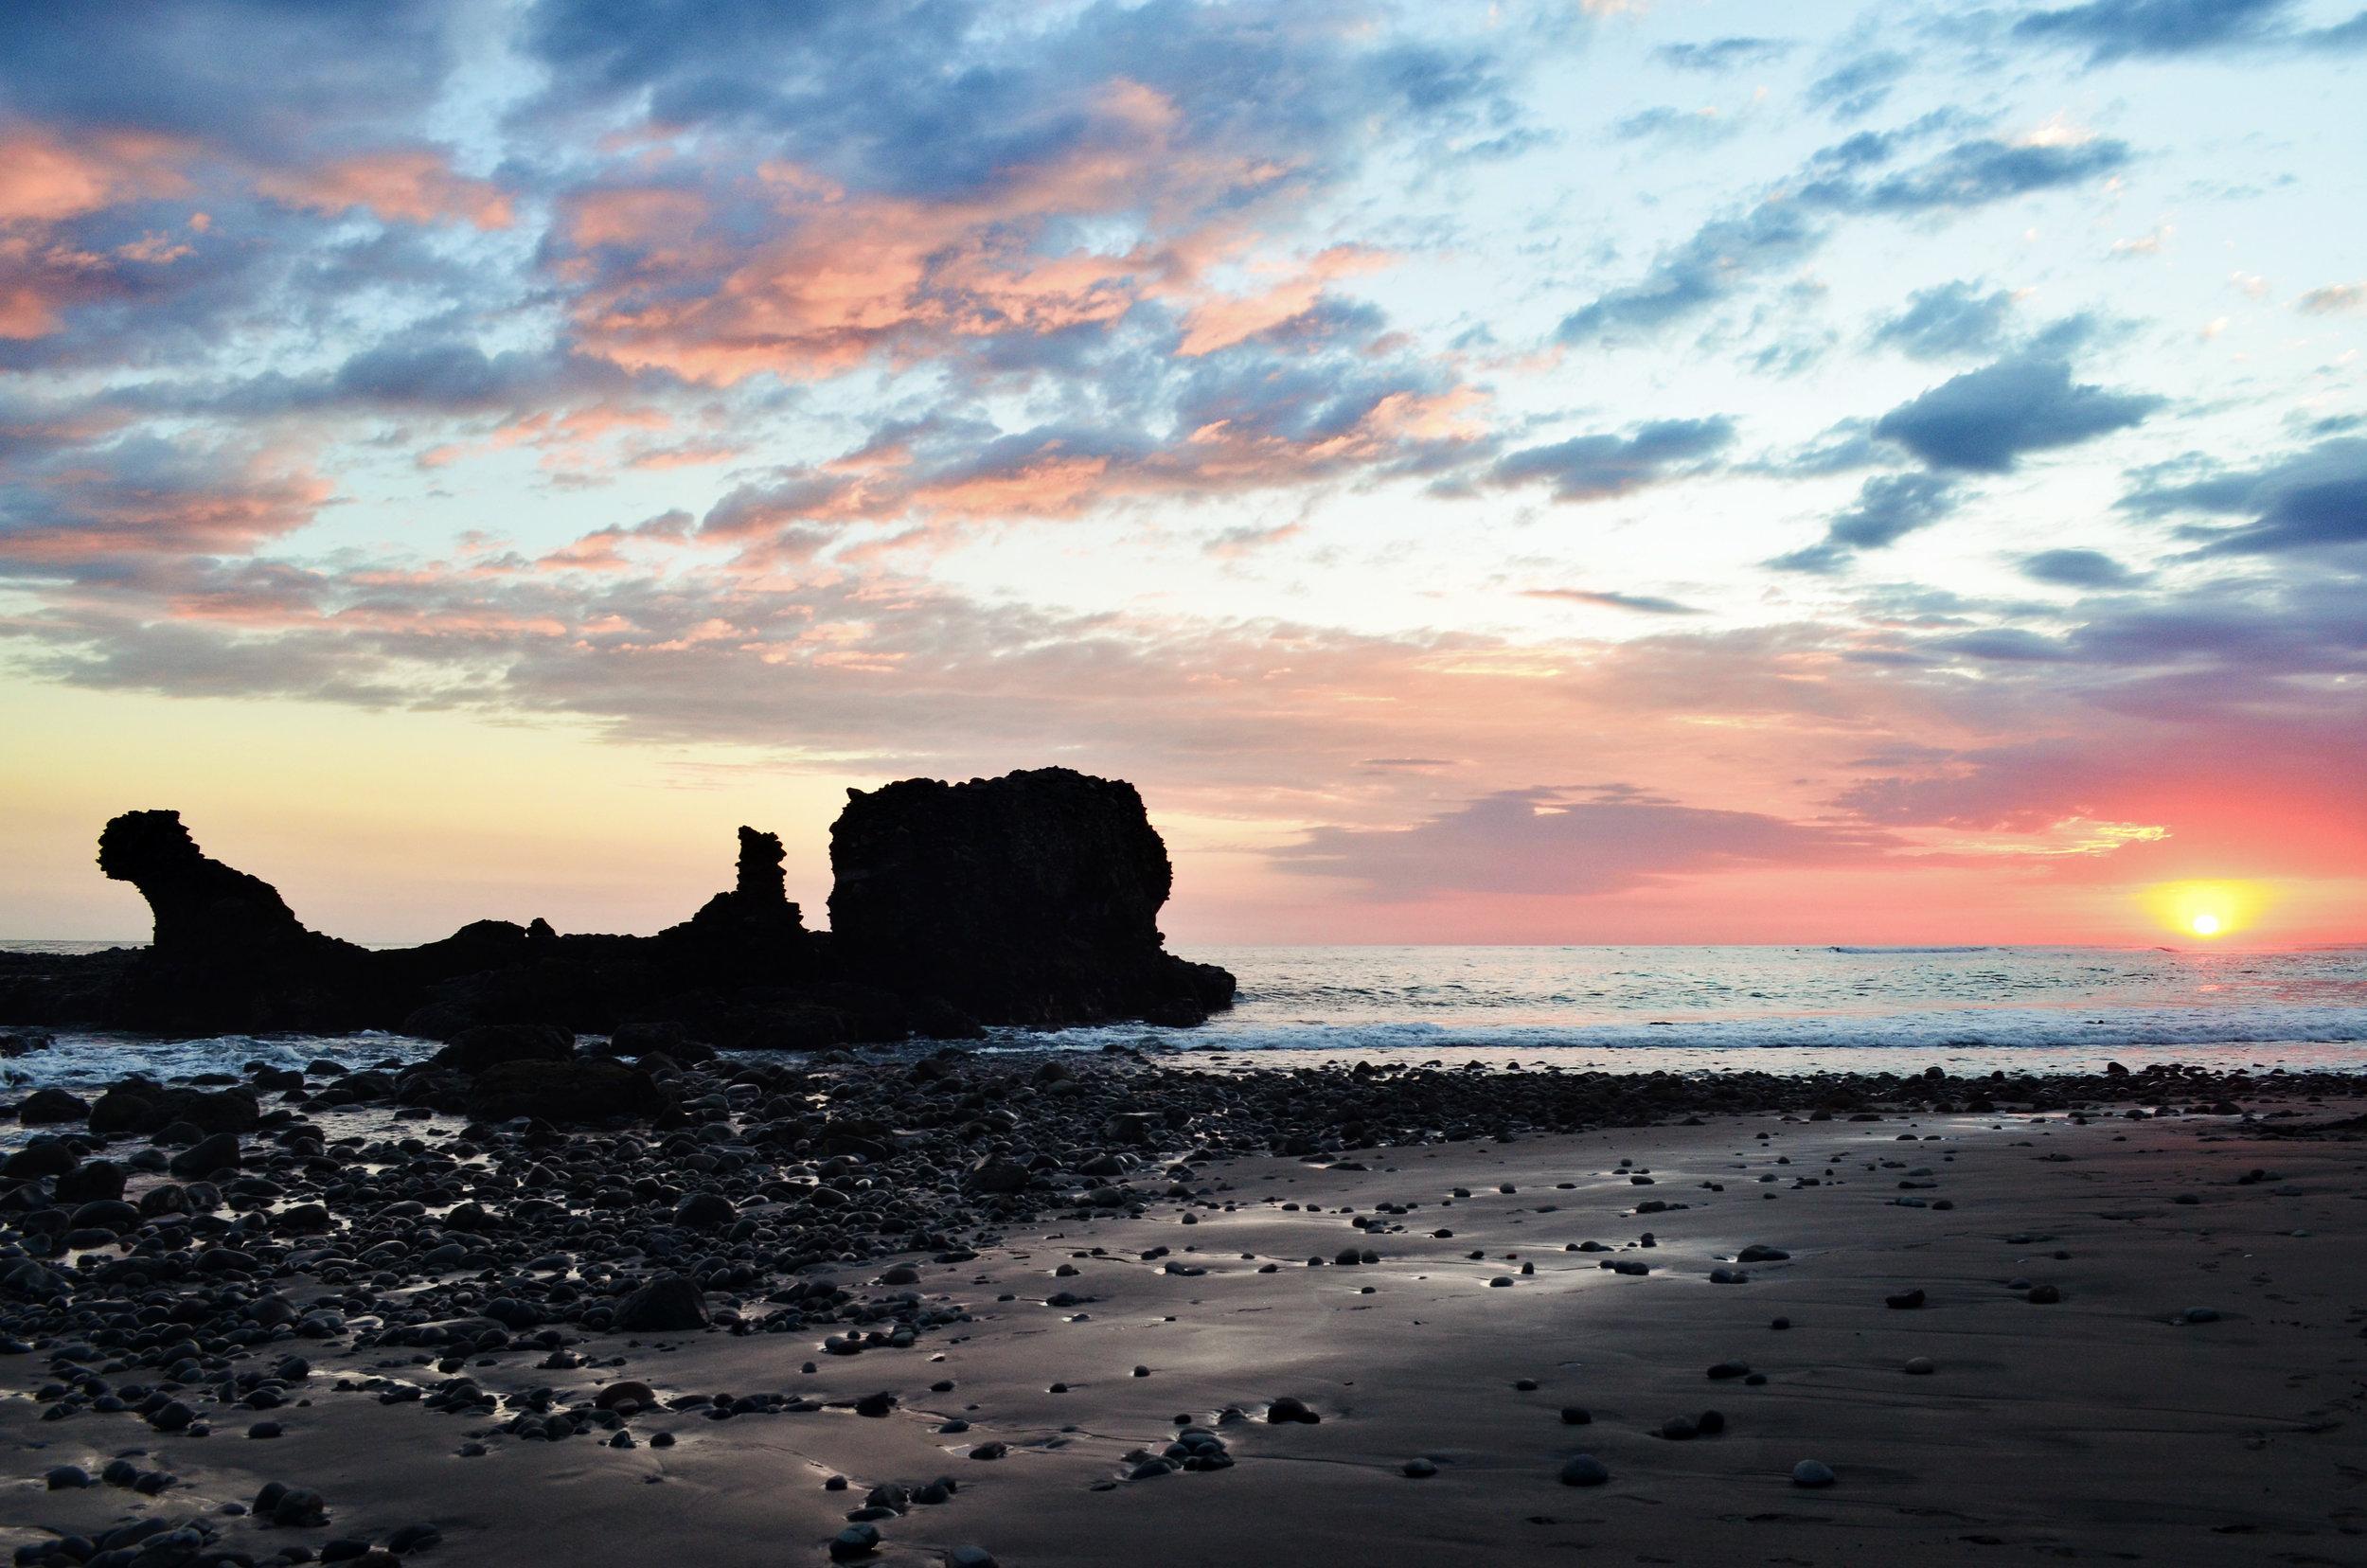 A beautiful sunset over the black sand beach at El Tunco, El Salvador